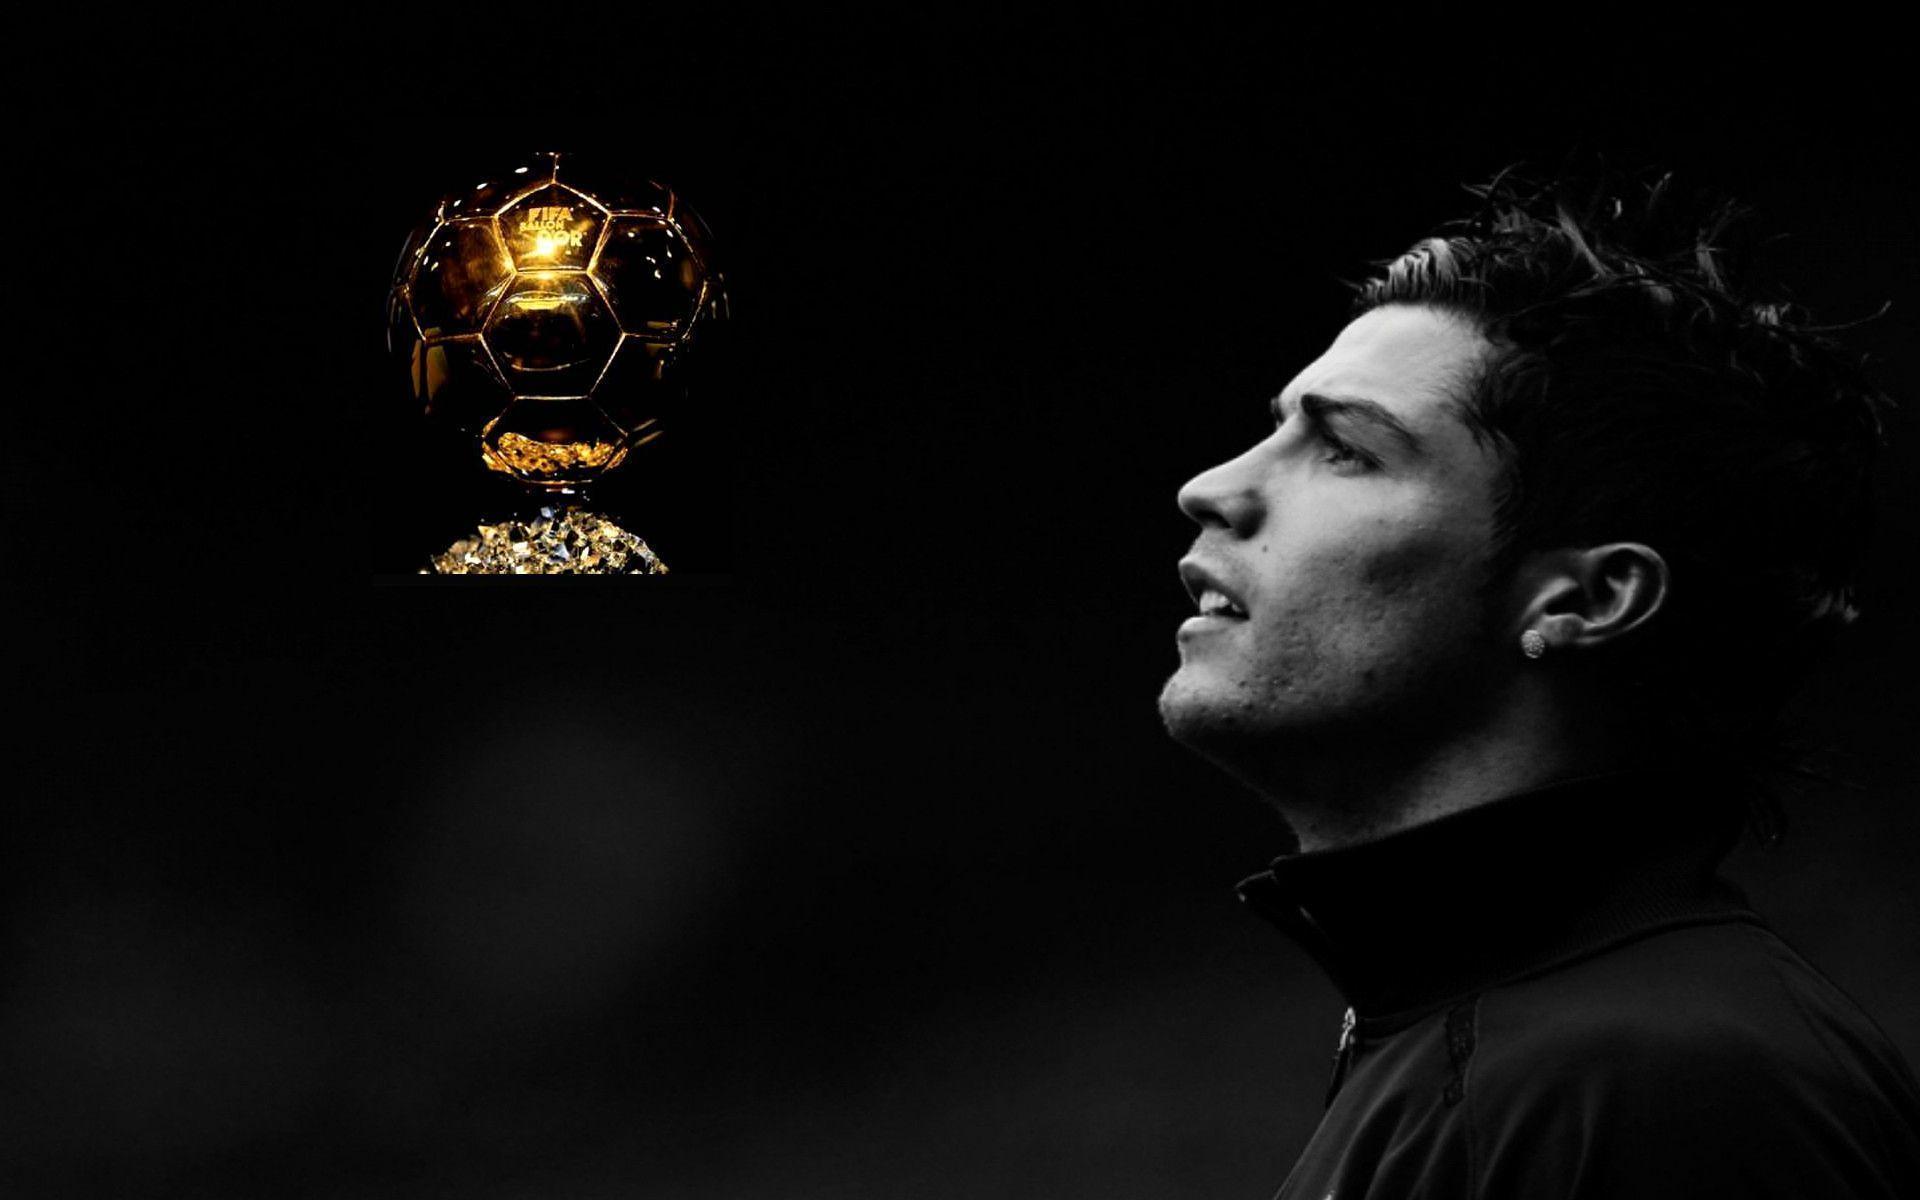 Cristiano Ronaldo Wallpapers 2015 Nike 1920x1200